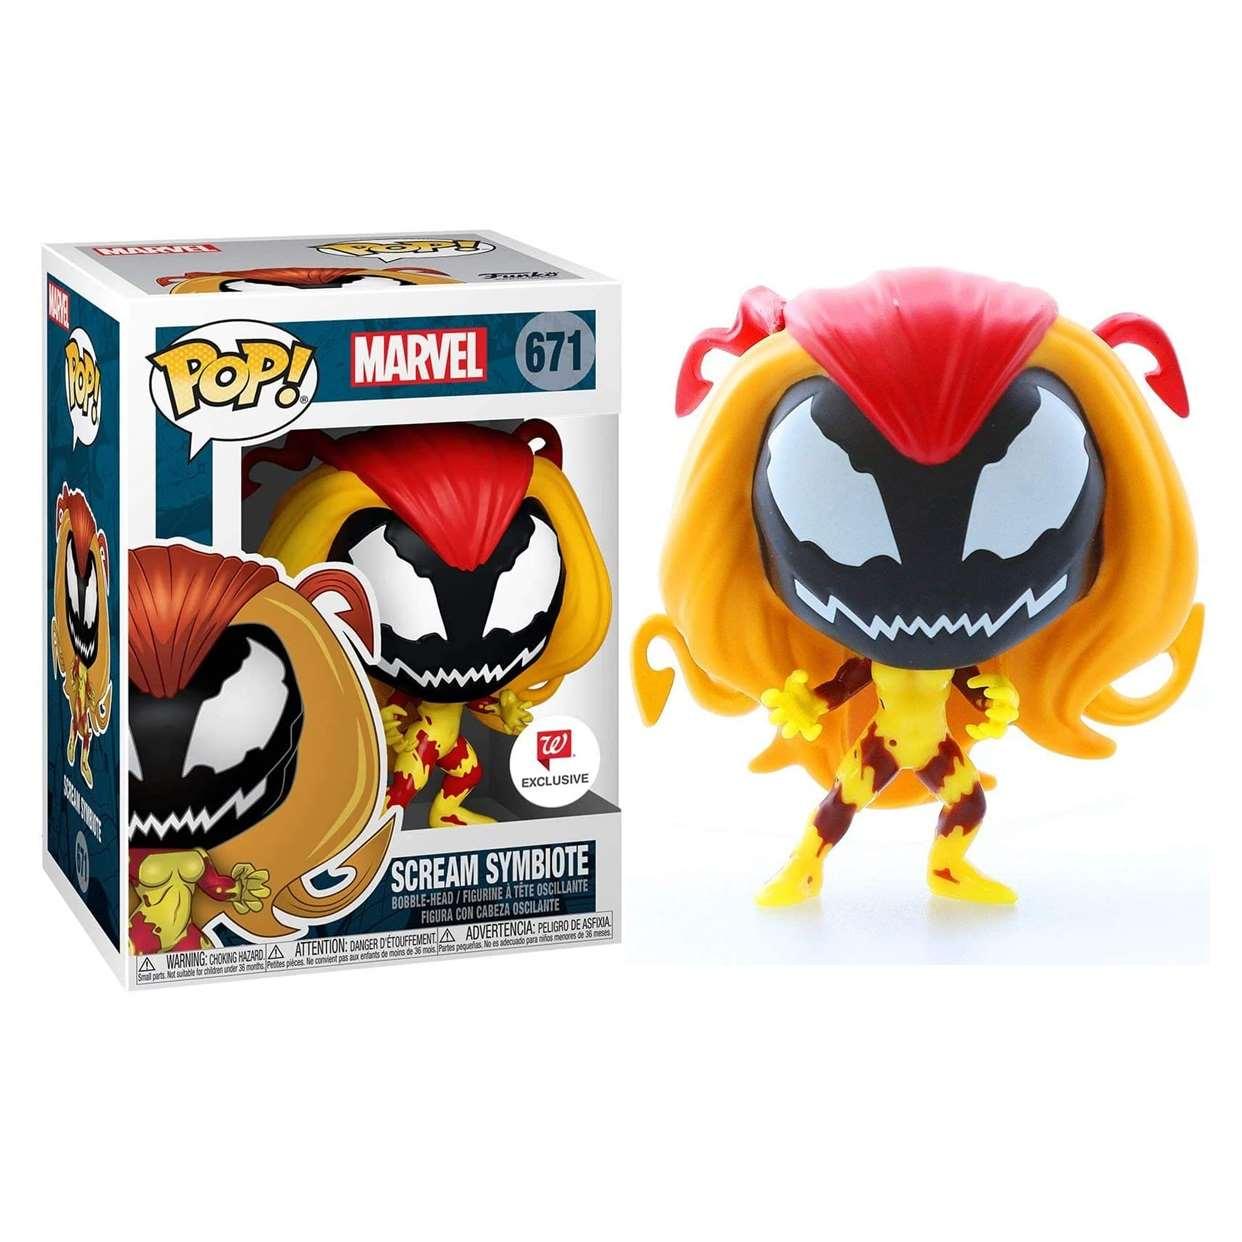 Scream Symbiote #671 Figura Marvel Funko Pop! Exc. Walgreens